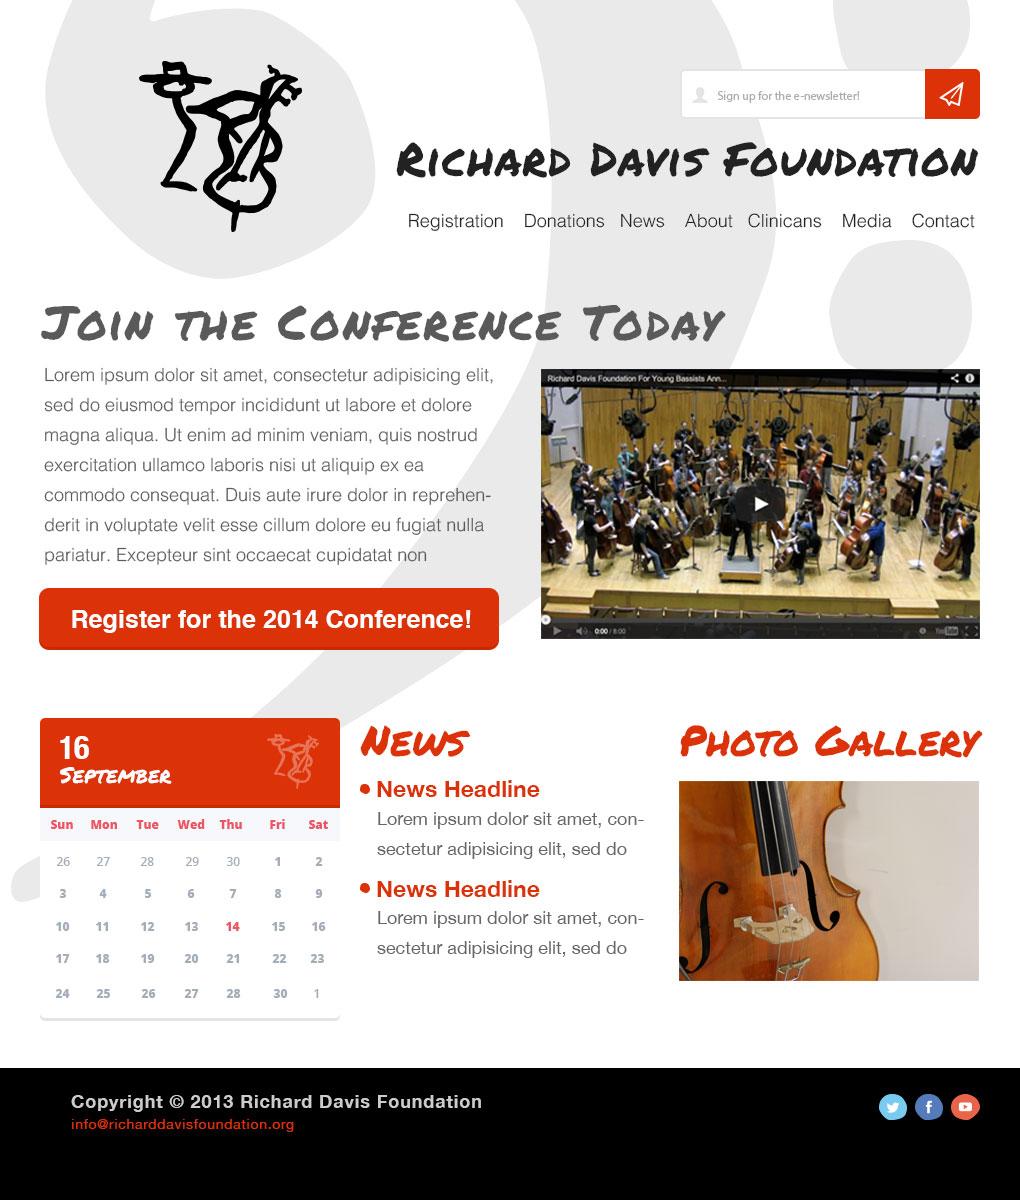 richard-davis-foundation